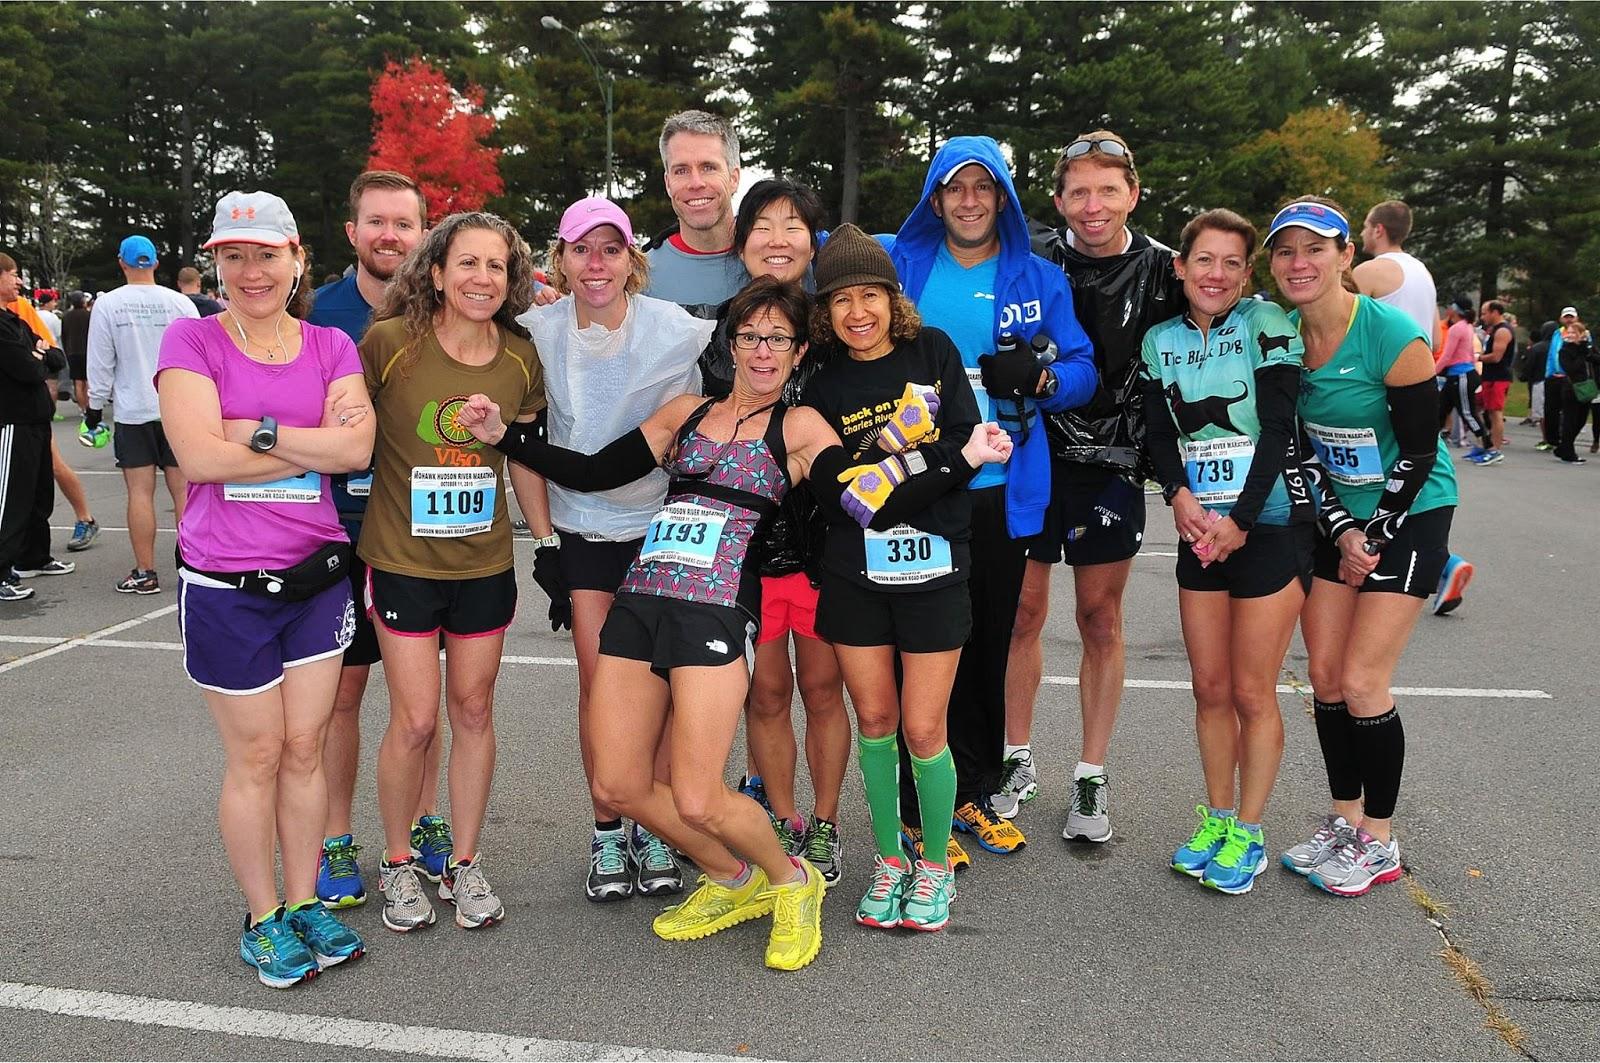 Mohawk Hudson Marathon with GNRC